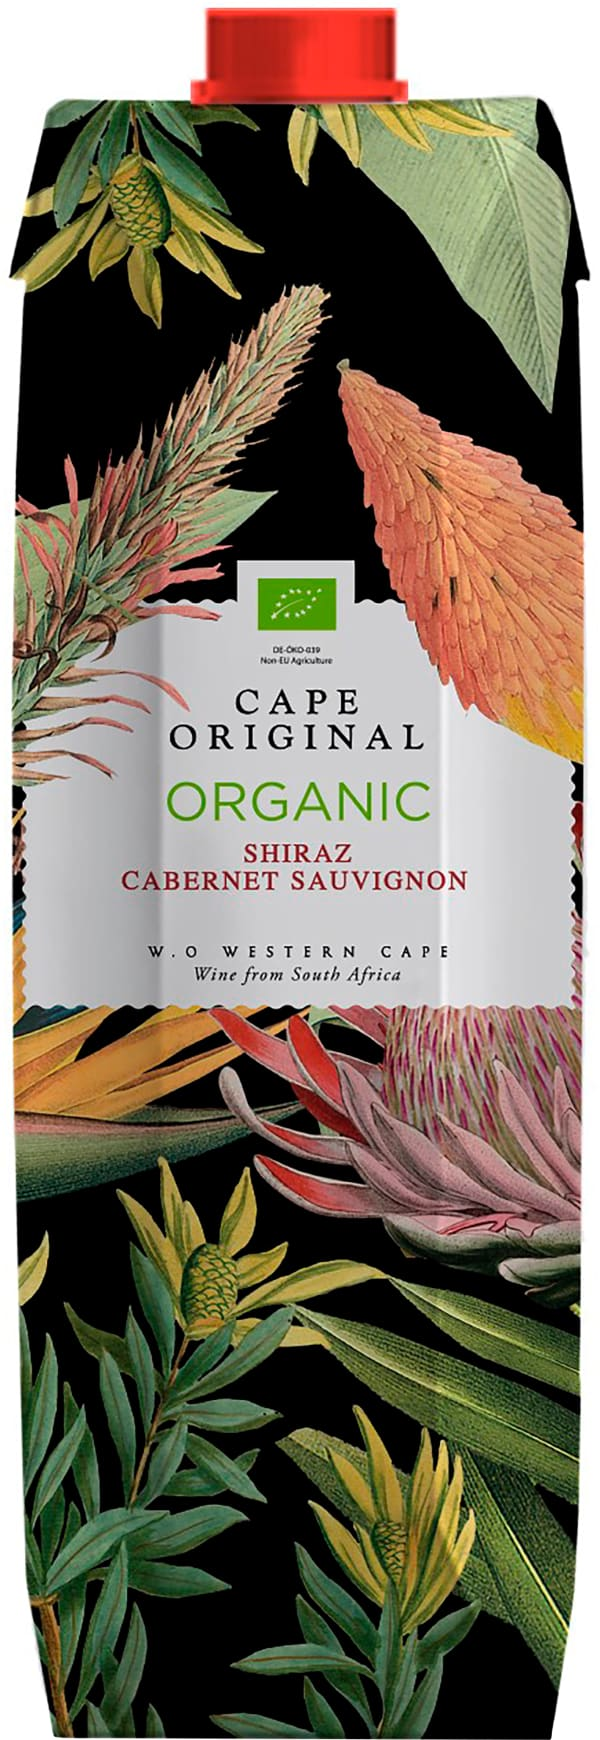 Cape Original Shiraz Cabernet Sauvignon Organic 2018 carton package